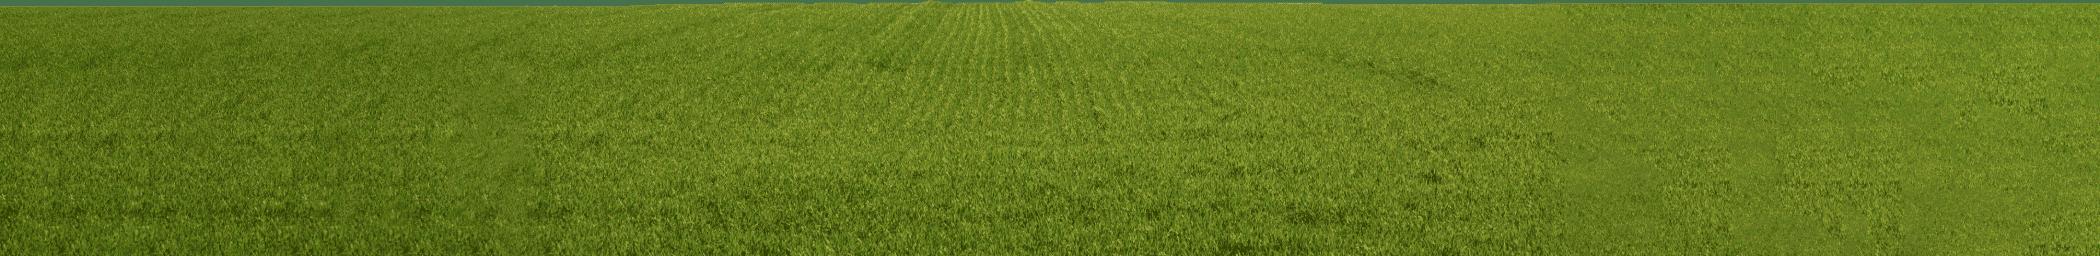 Natural environment, Land lot, Ecoregion, Green, Plant, Rectangle, Grass